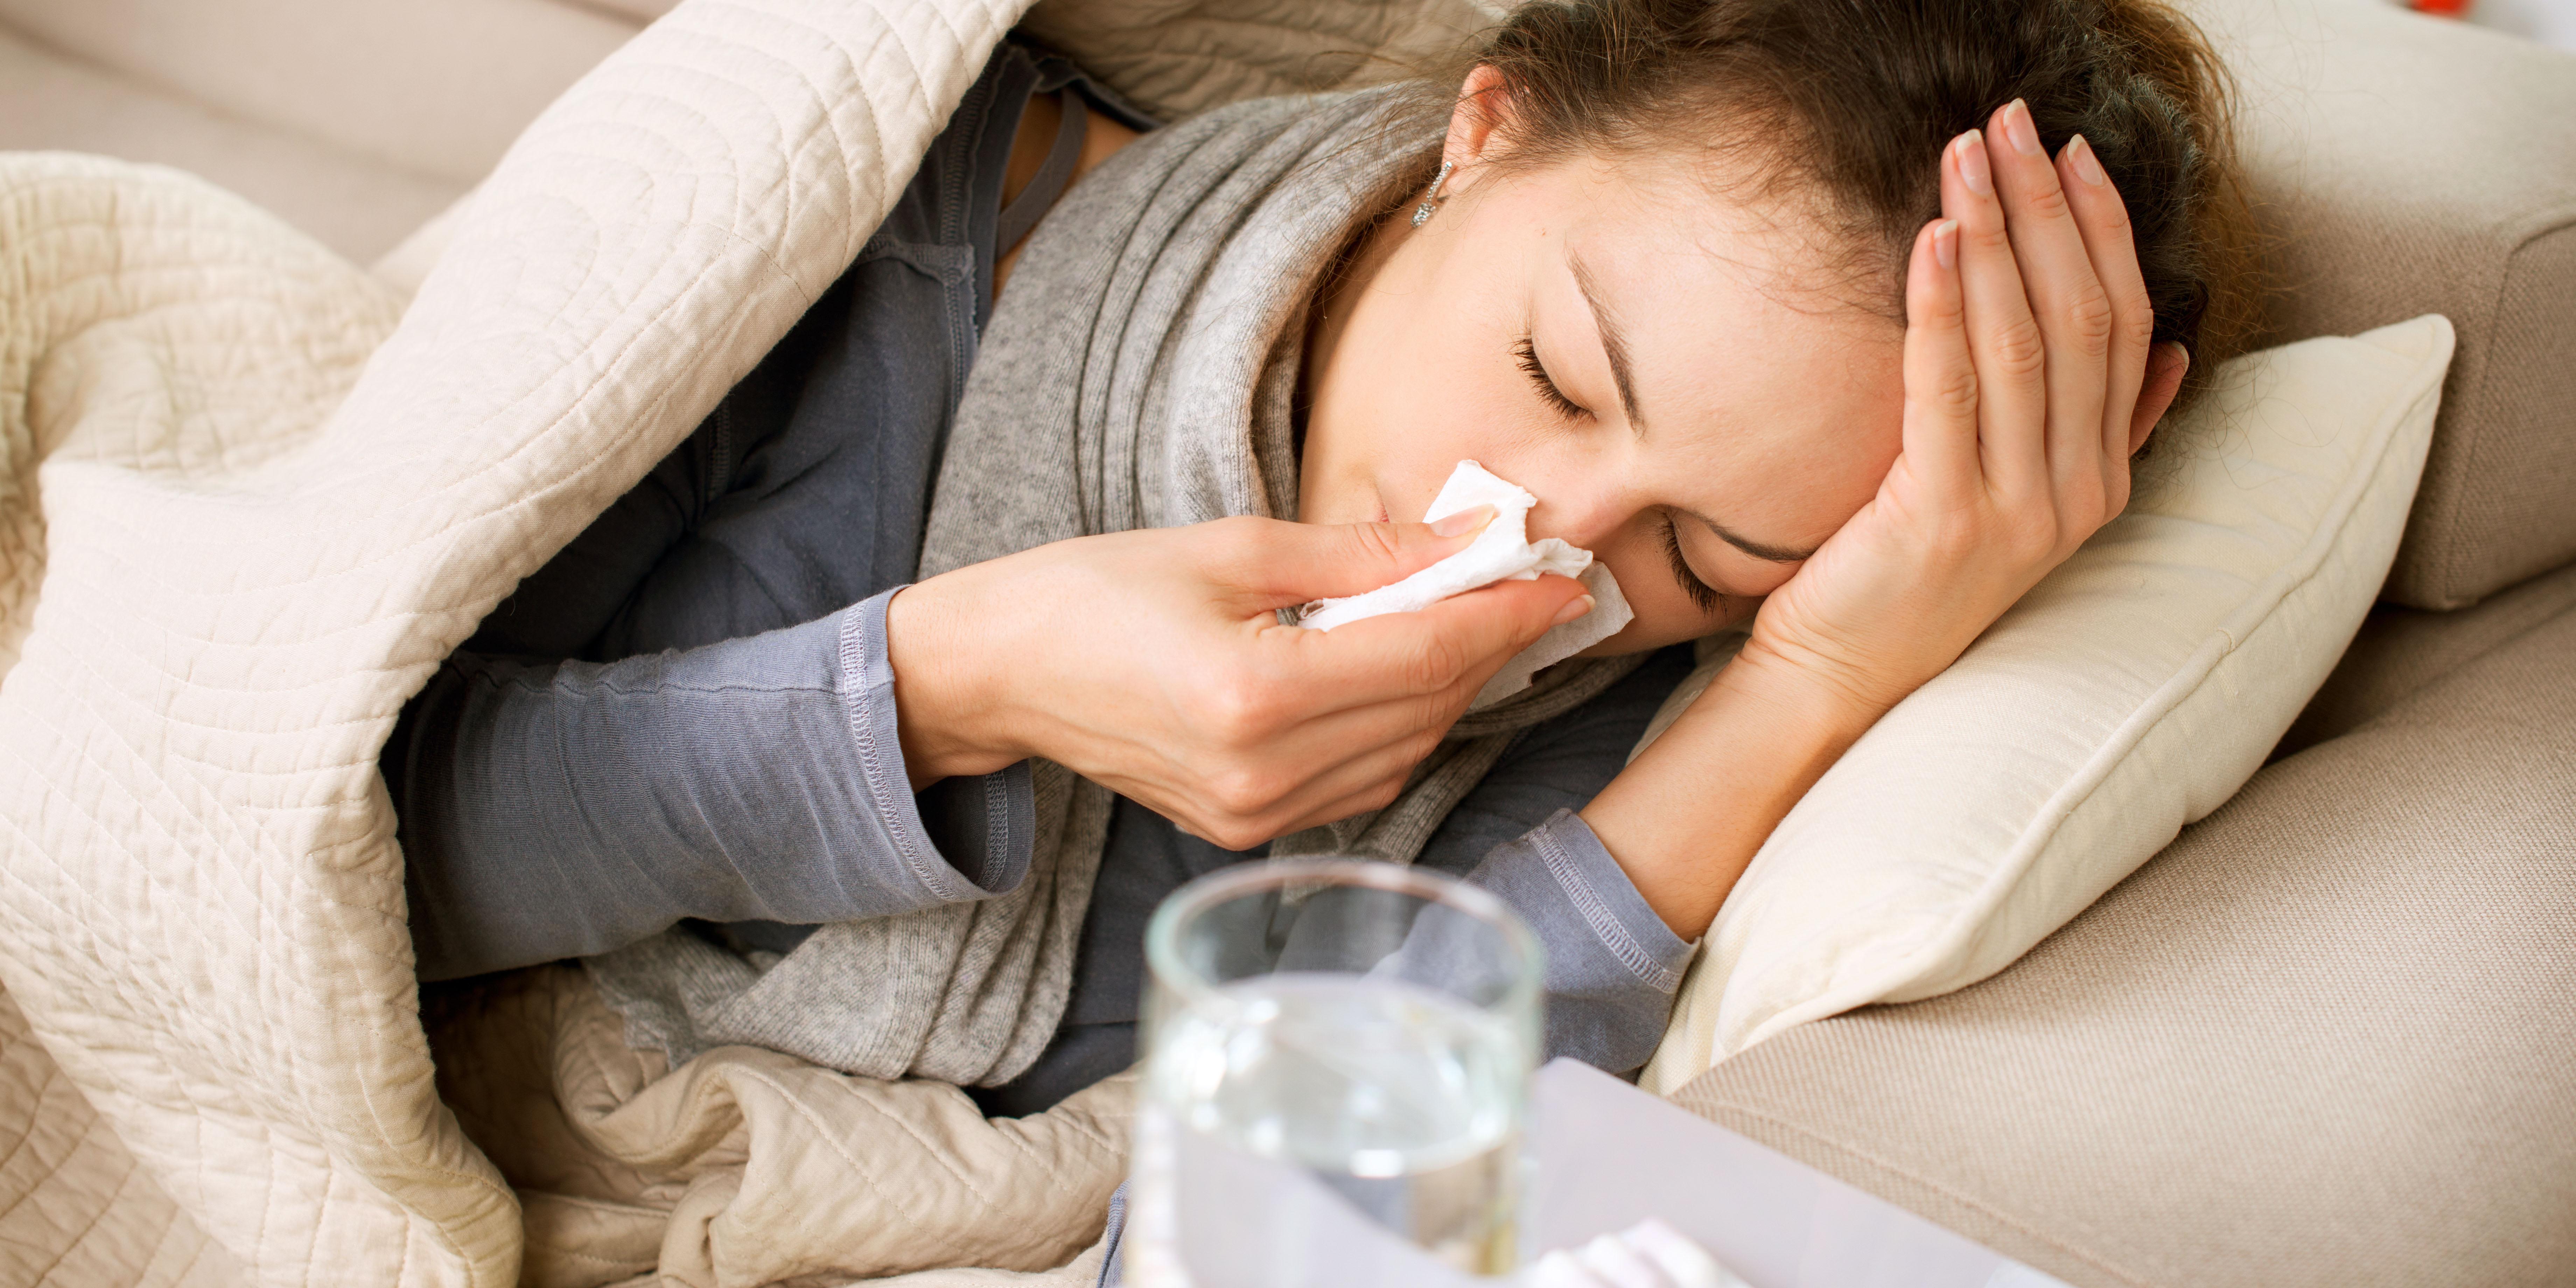 We Need Cheap, Natural Flu Medicine